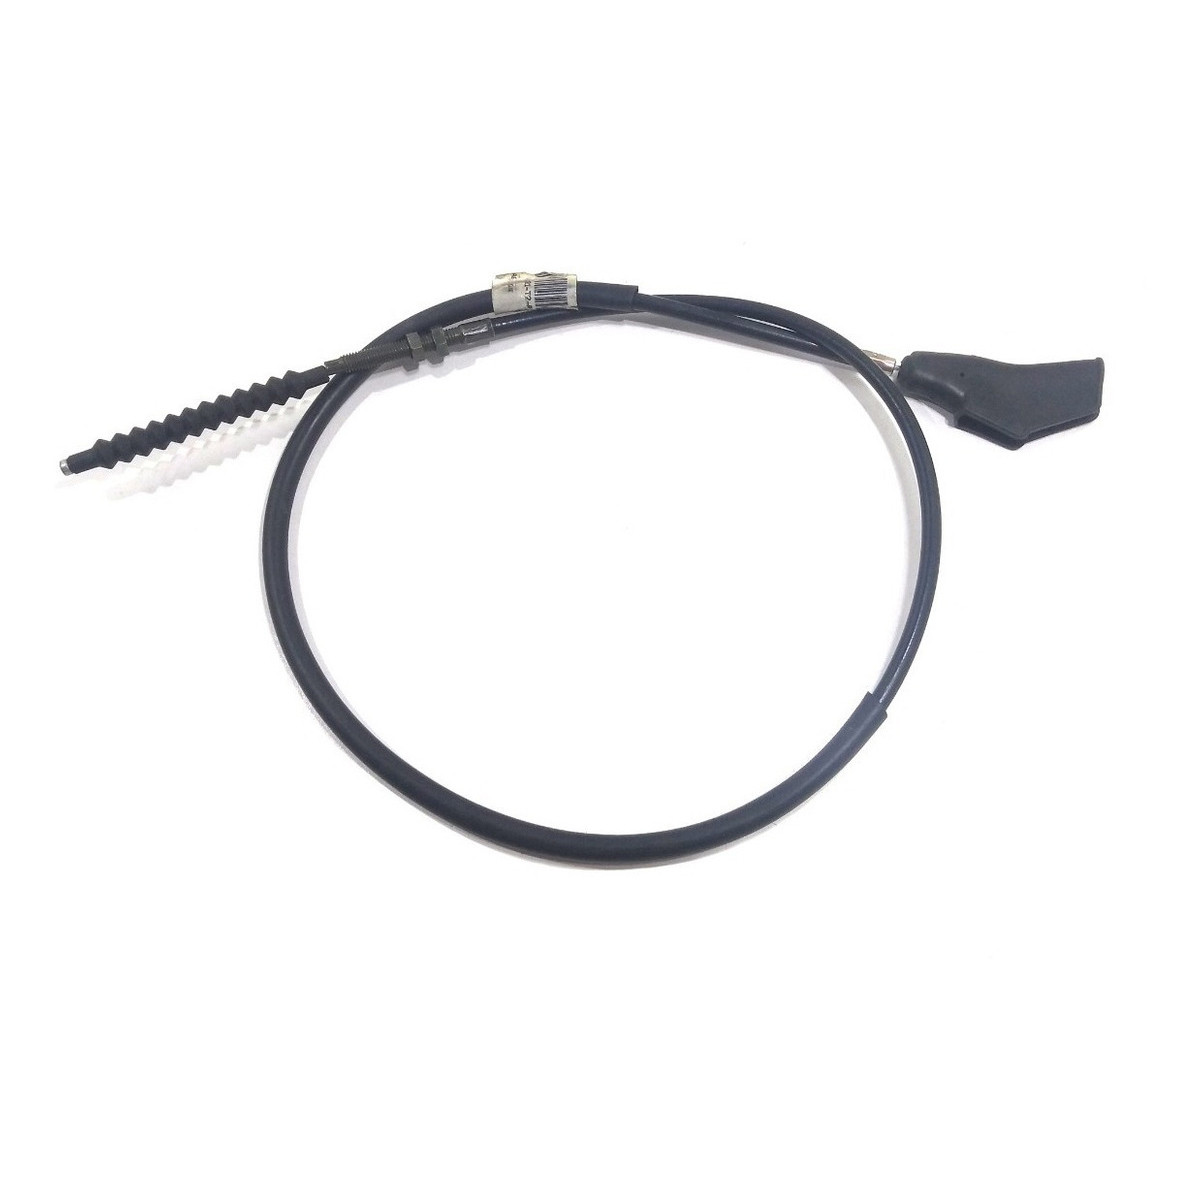 Cable Embrague Corven Triax 250 R3 Original